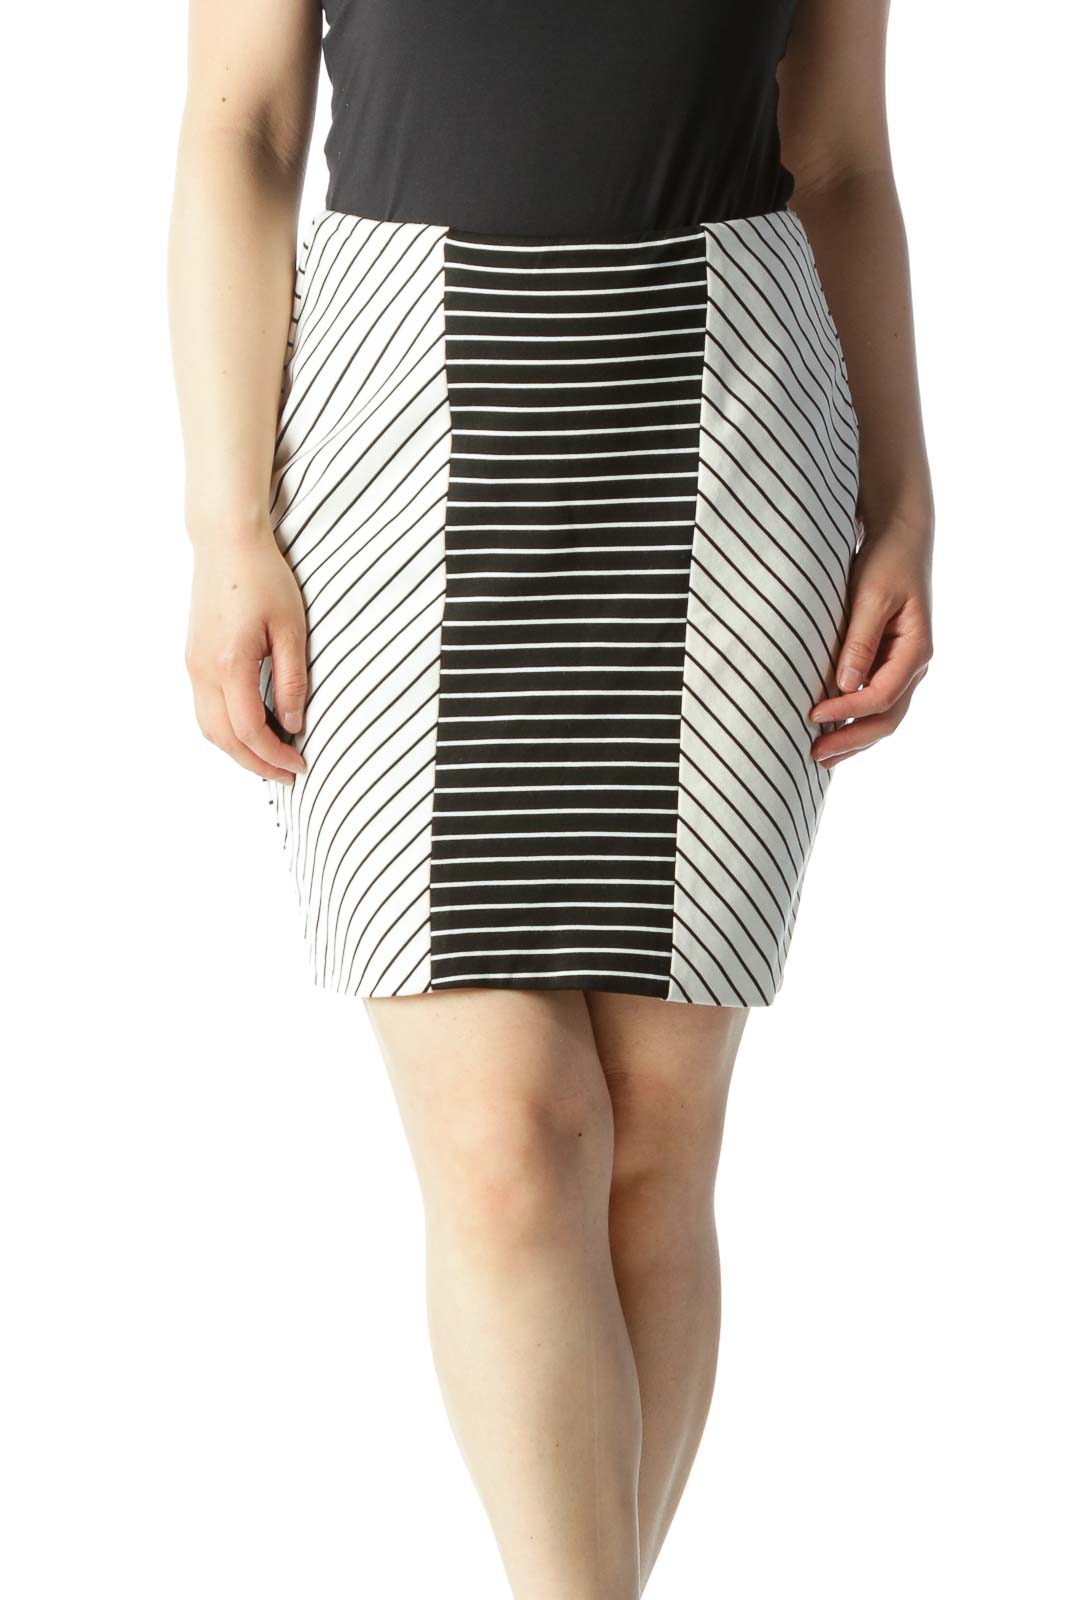 Black & White Striped Color-Blocked Knit Skirt Front